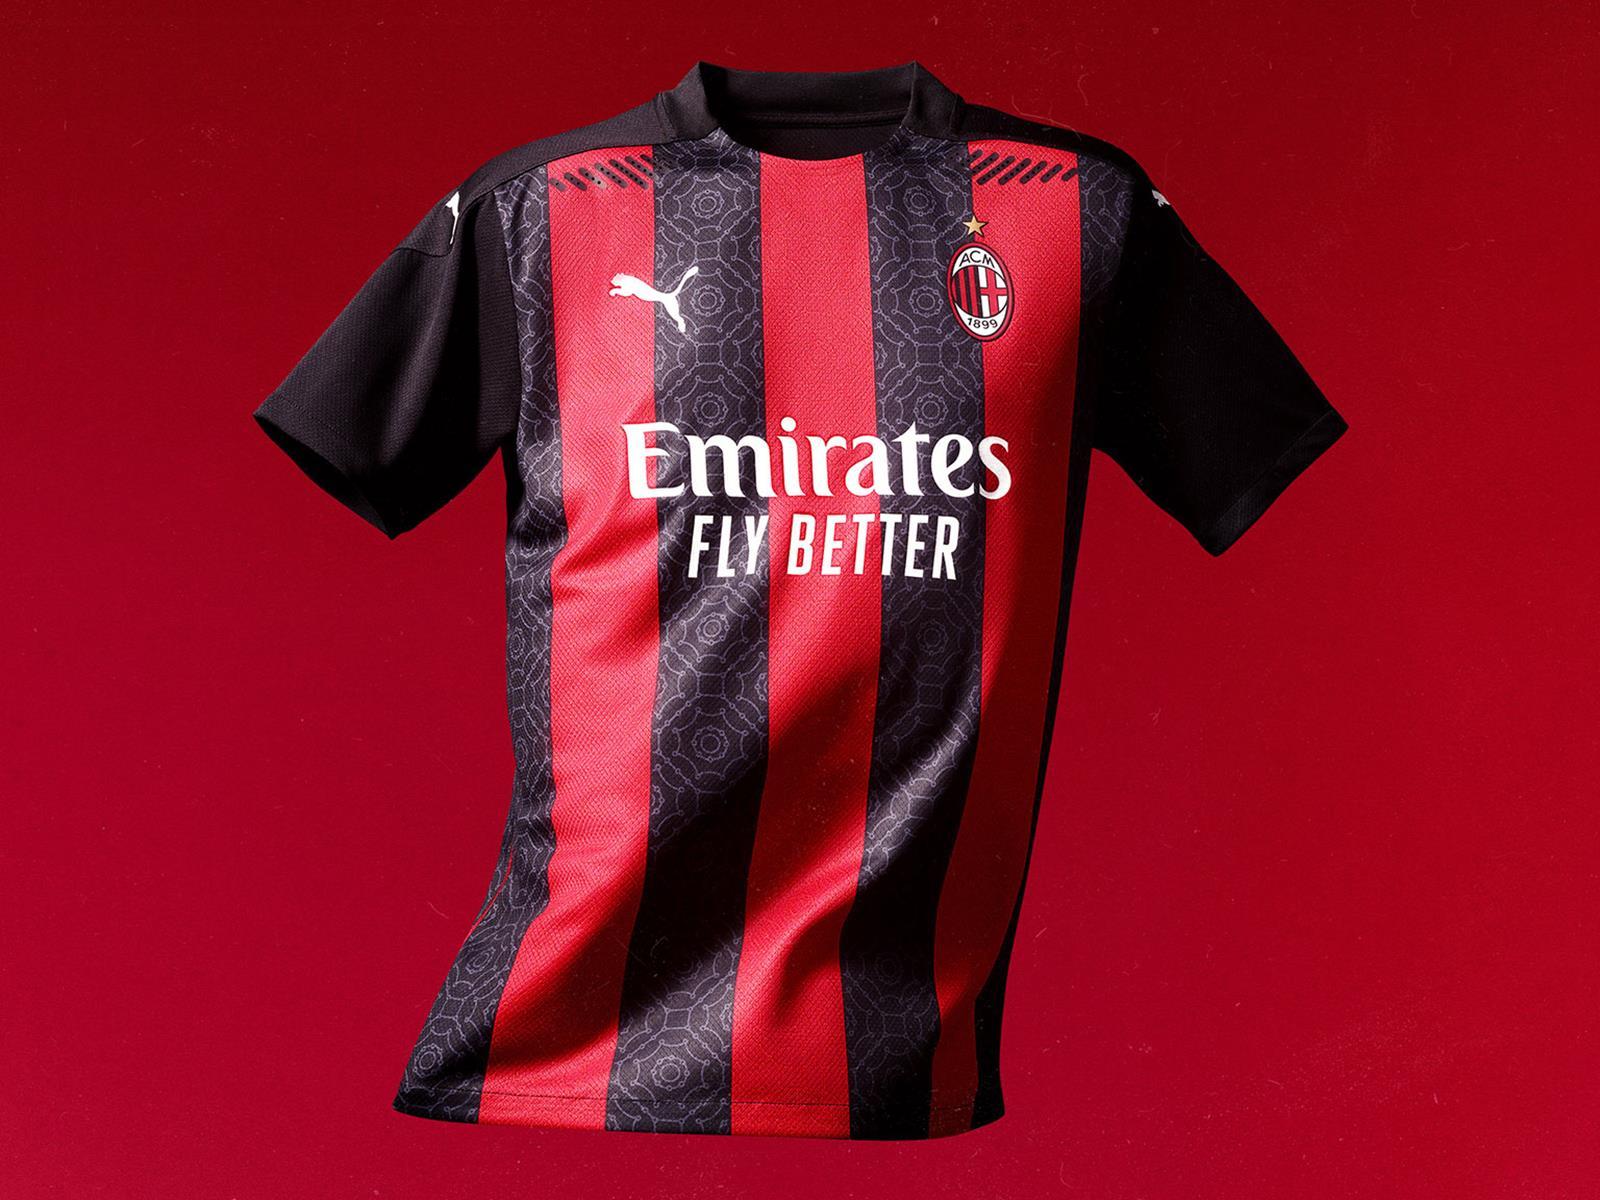 AC Milan 2020-21 Puma Home Kit | 20/21 Kits | Football shirt blog